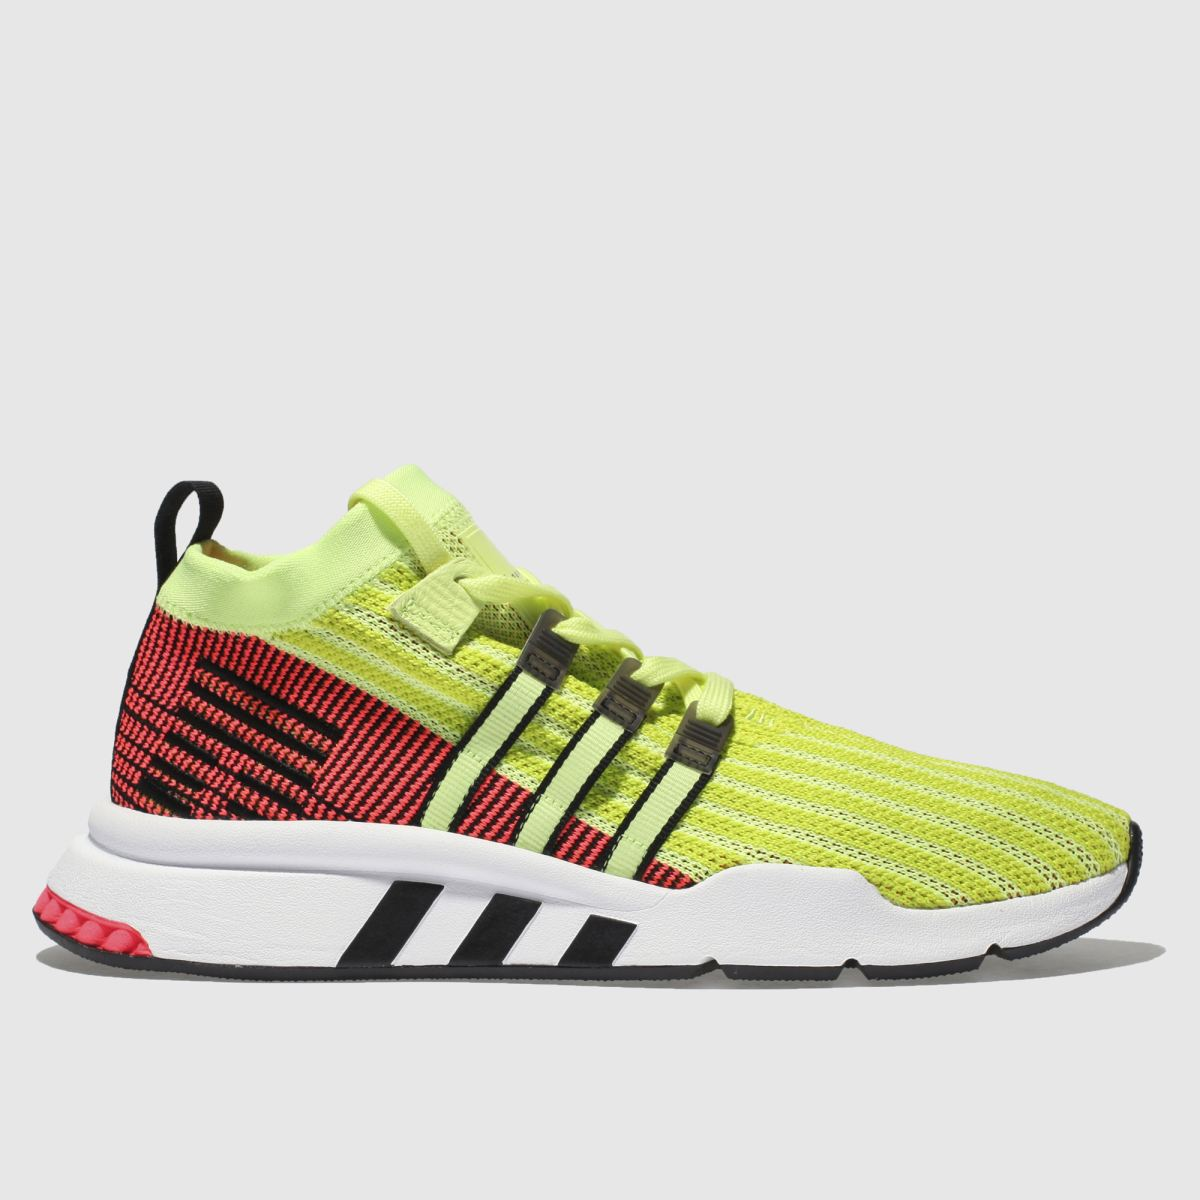 Adidas Adidas Yellow Eqt Support Mid Adv Primeknit Trainers